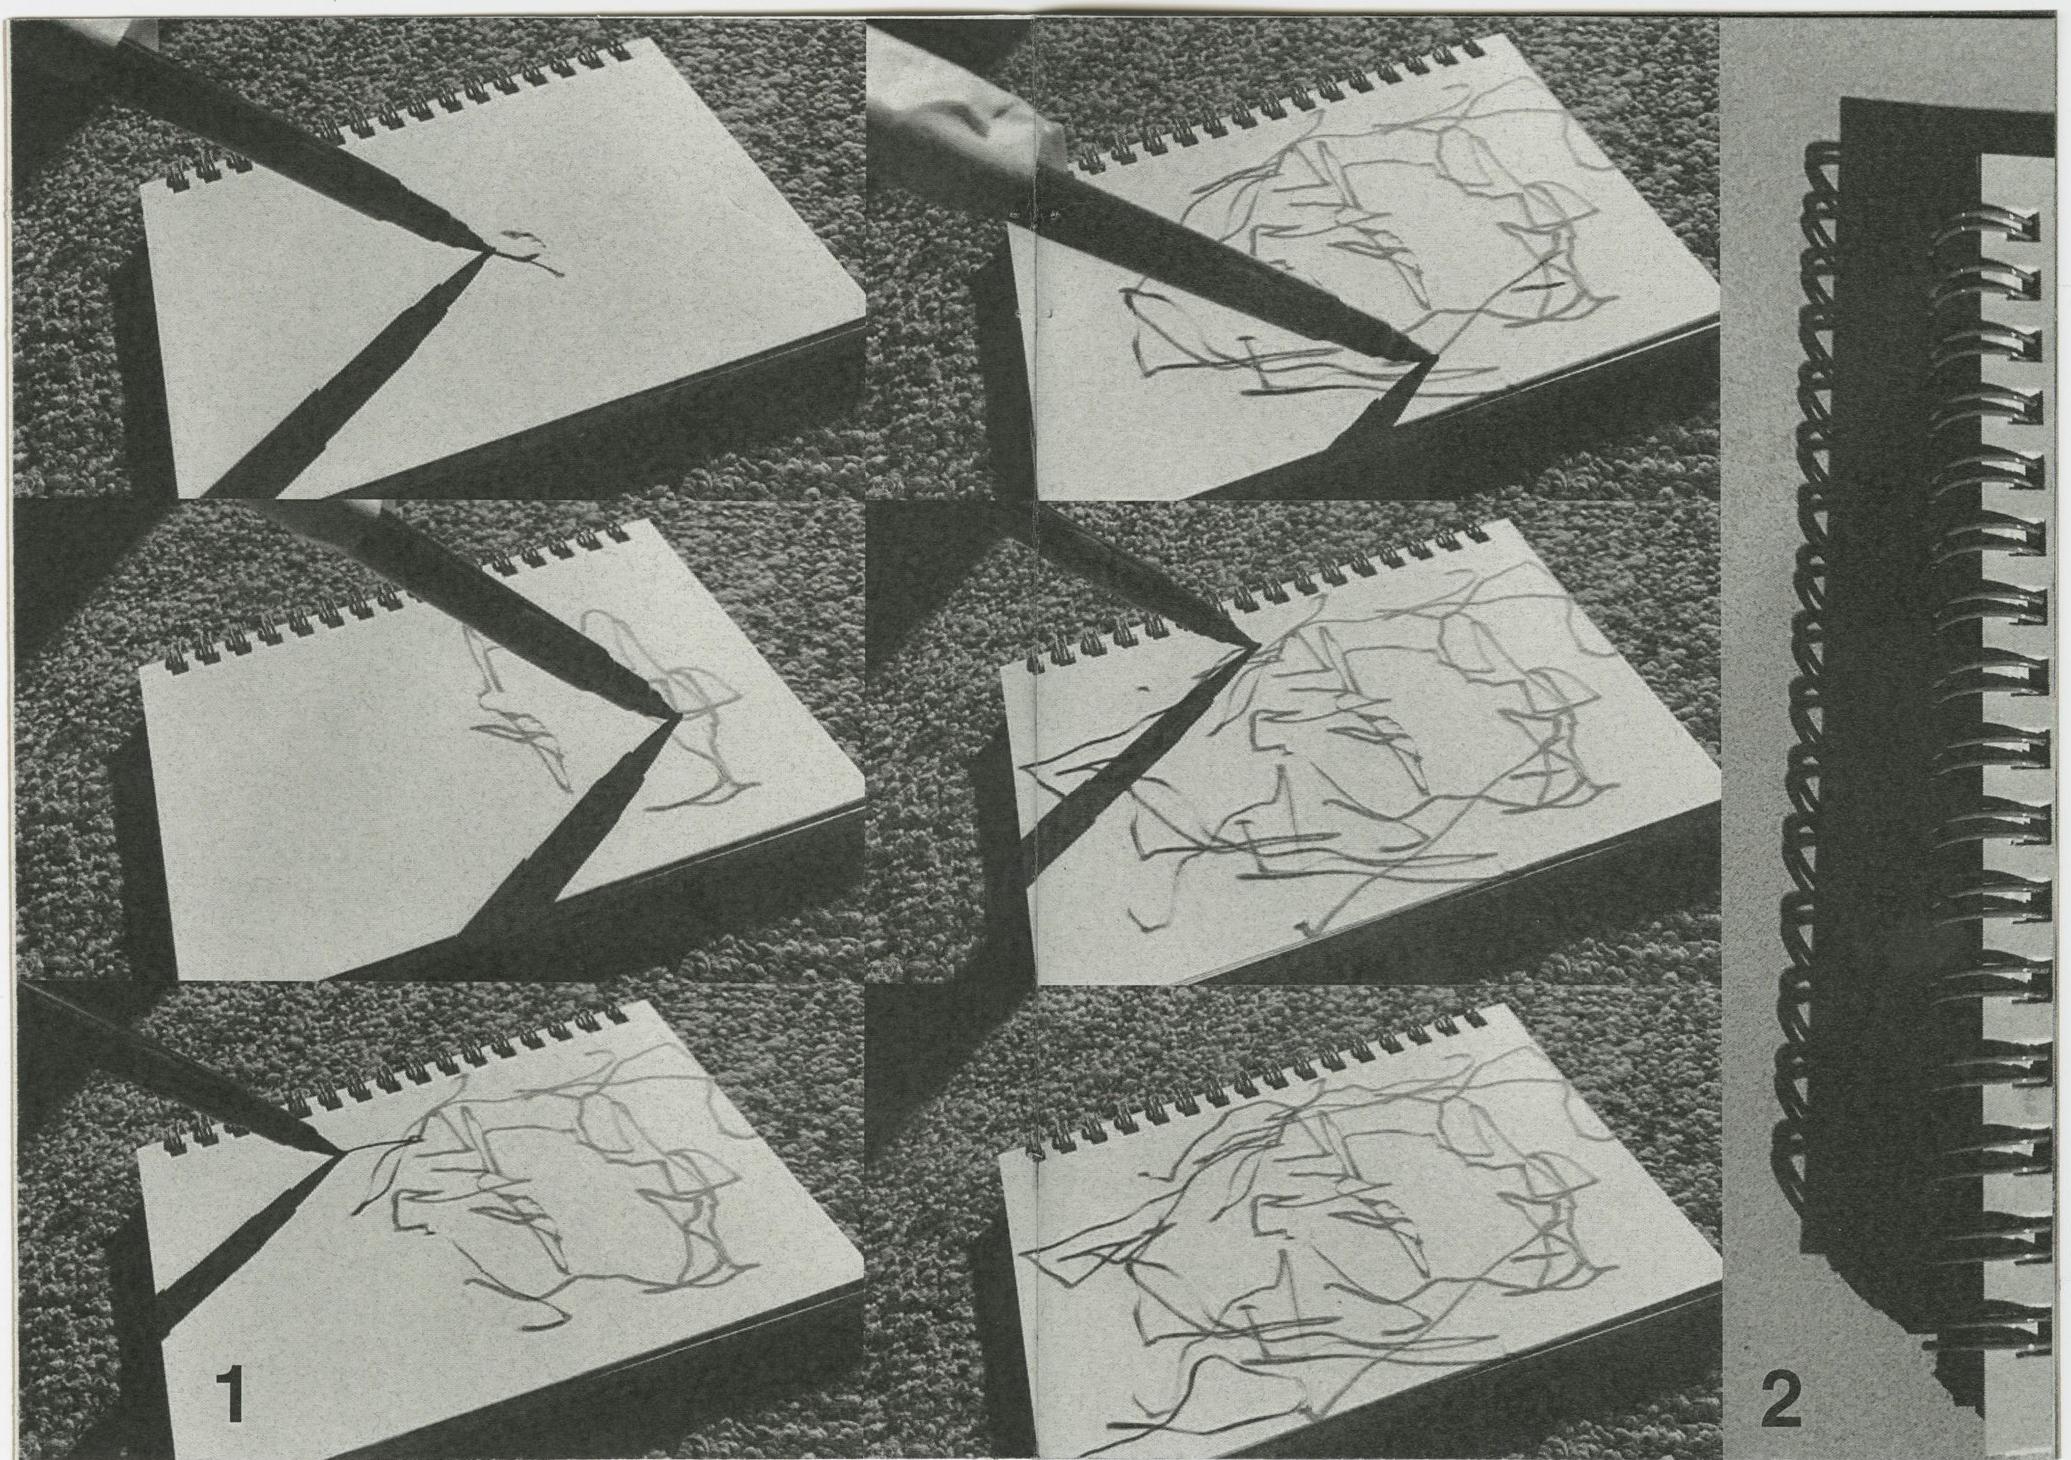 drawing restraint process 3.jpeg